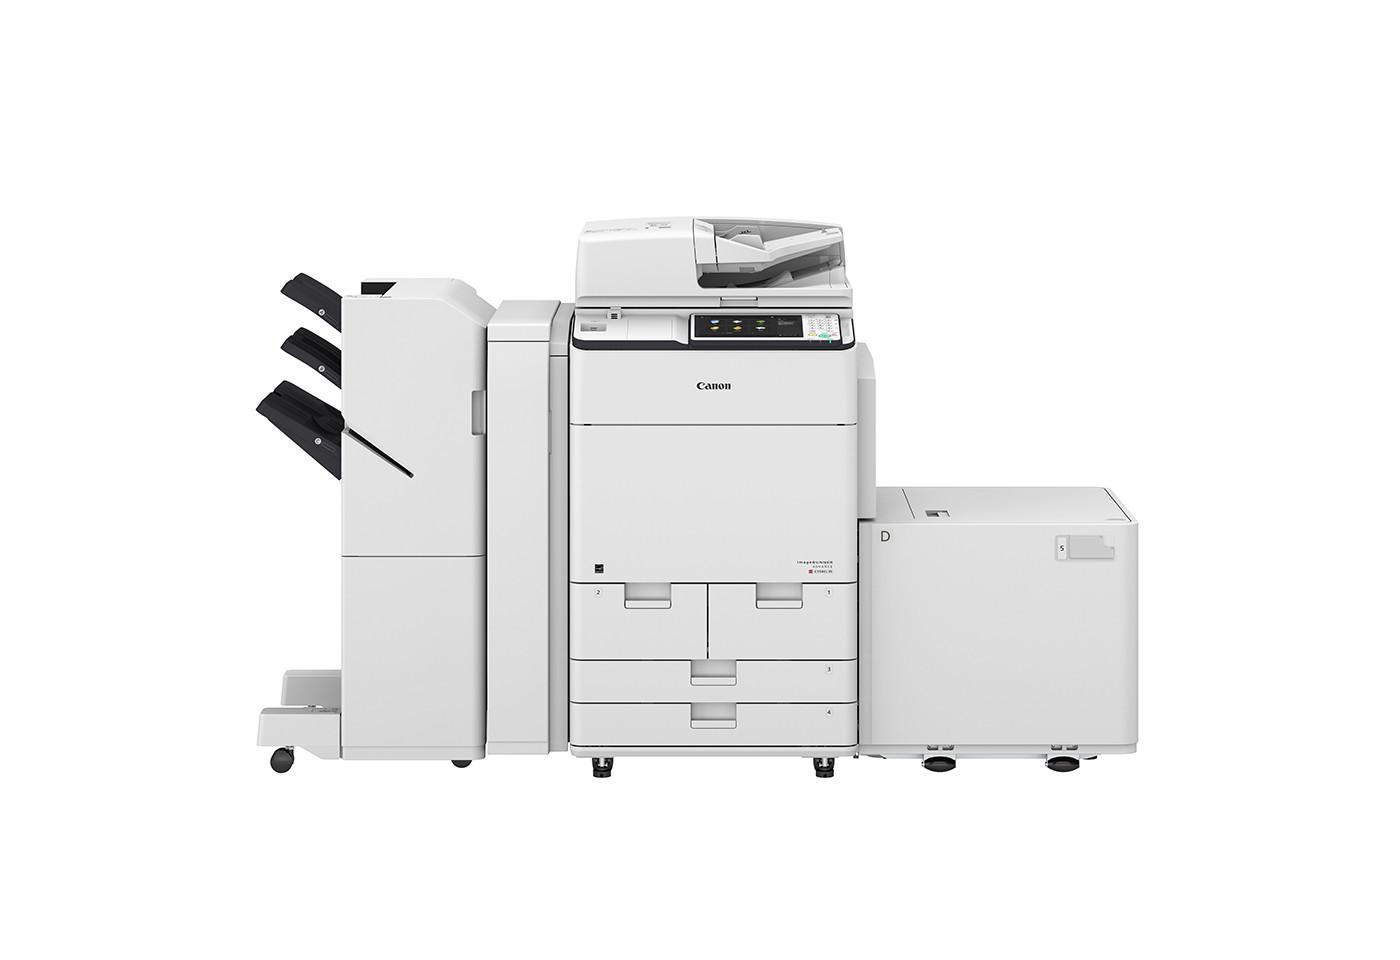 imageRUNNER ADVANCE C7500